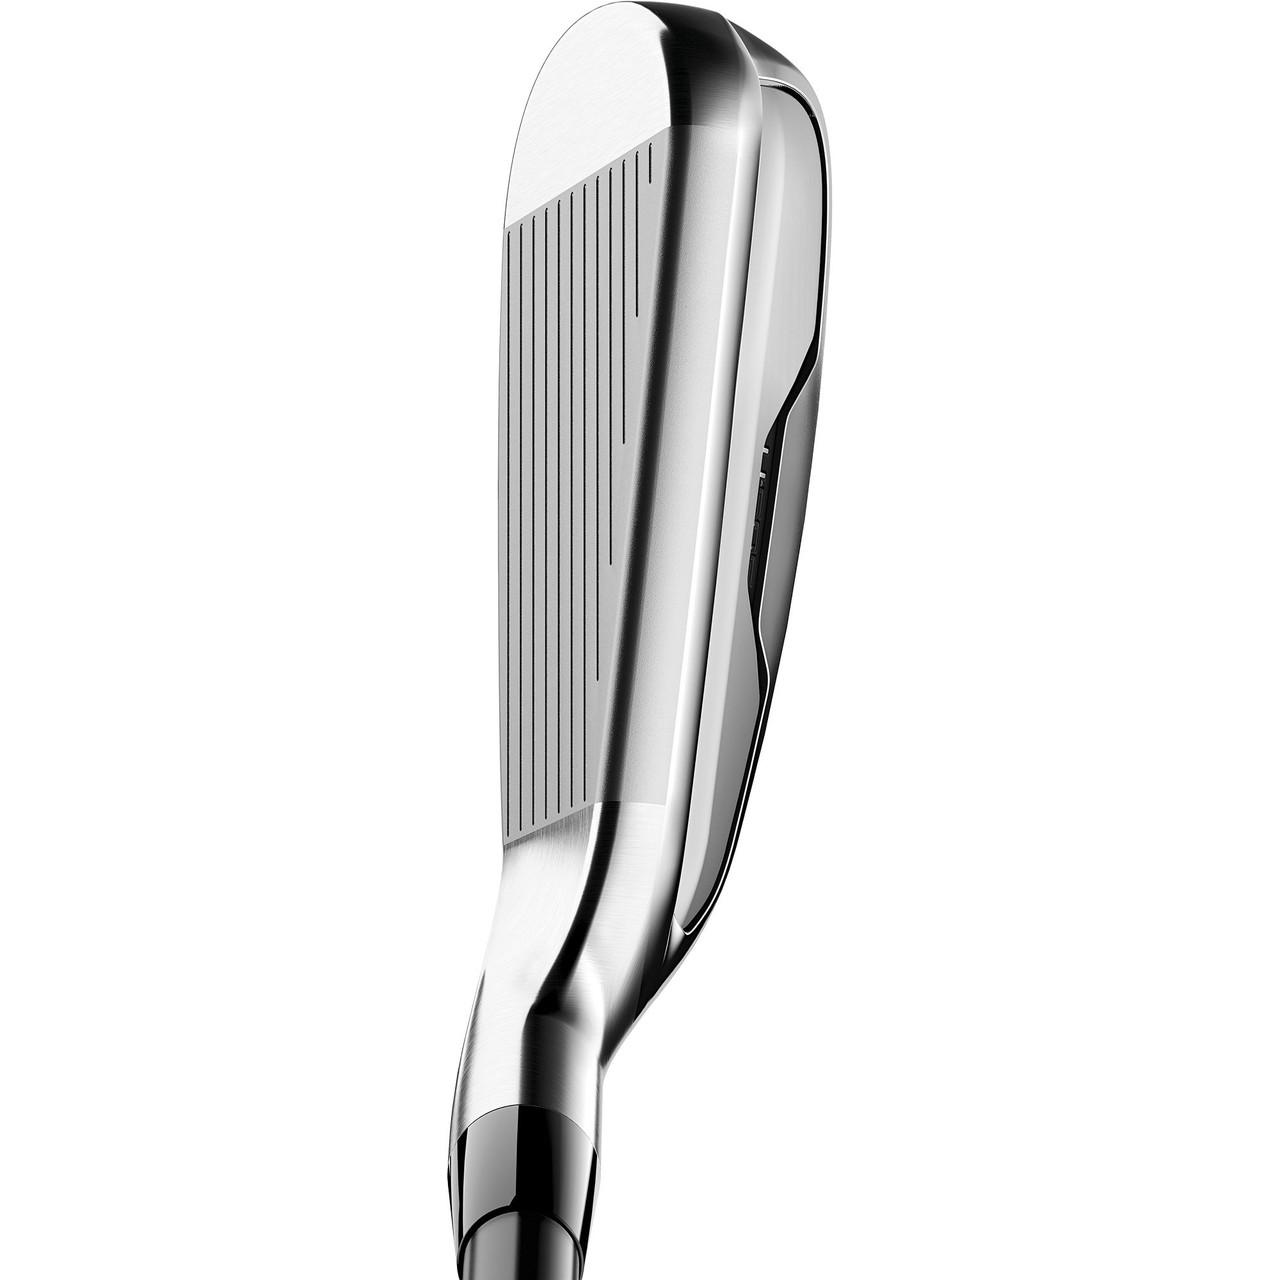 Titleist U-505 Premium Shaft Utility Irons